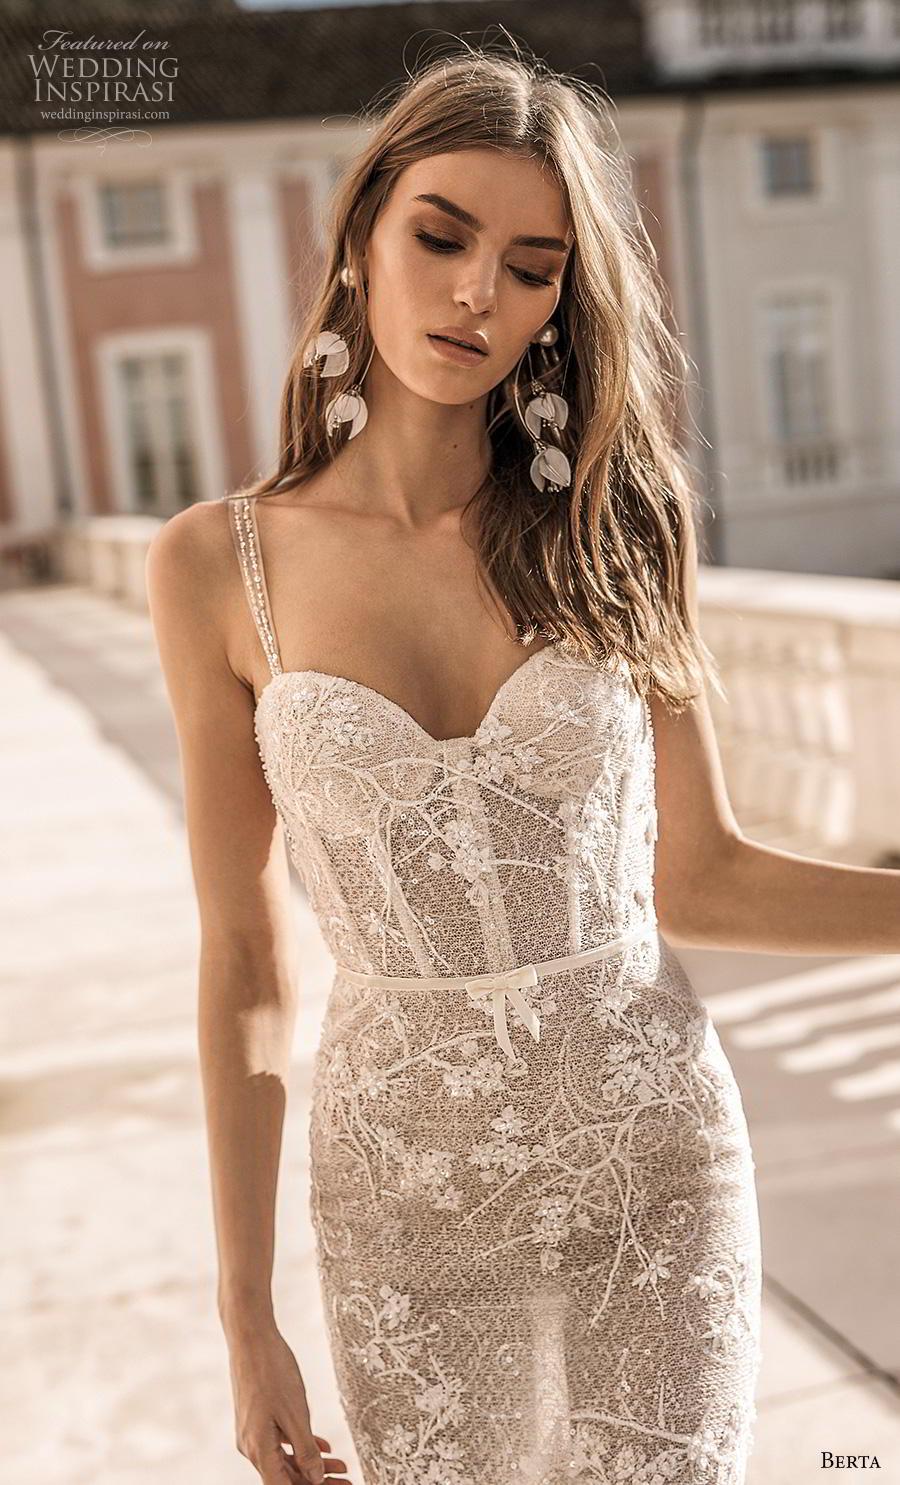 berta 2019 privee bridal thin strap sweetheart neckline heavily embellished bodice bustier sexy romantic mermaid wedding dress low open back backless chapel train (2) zv